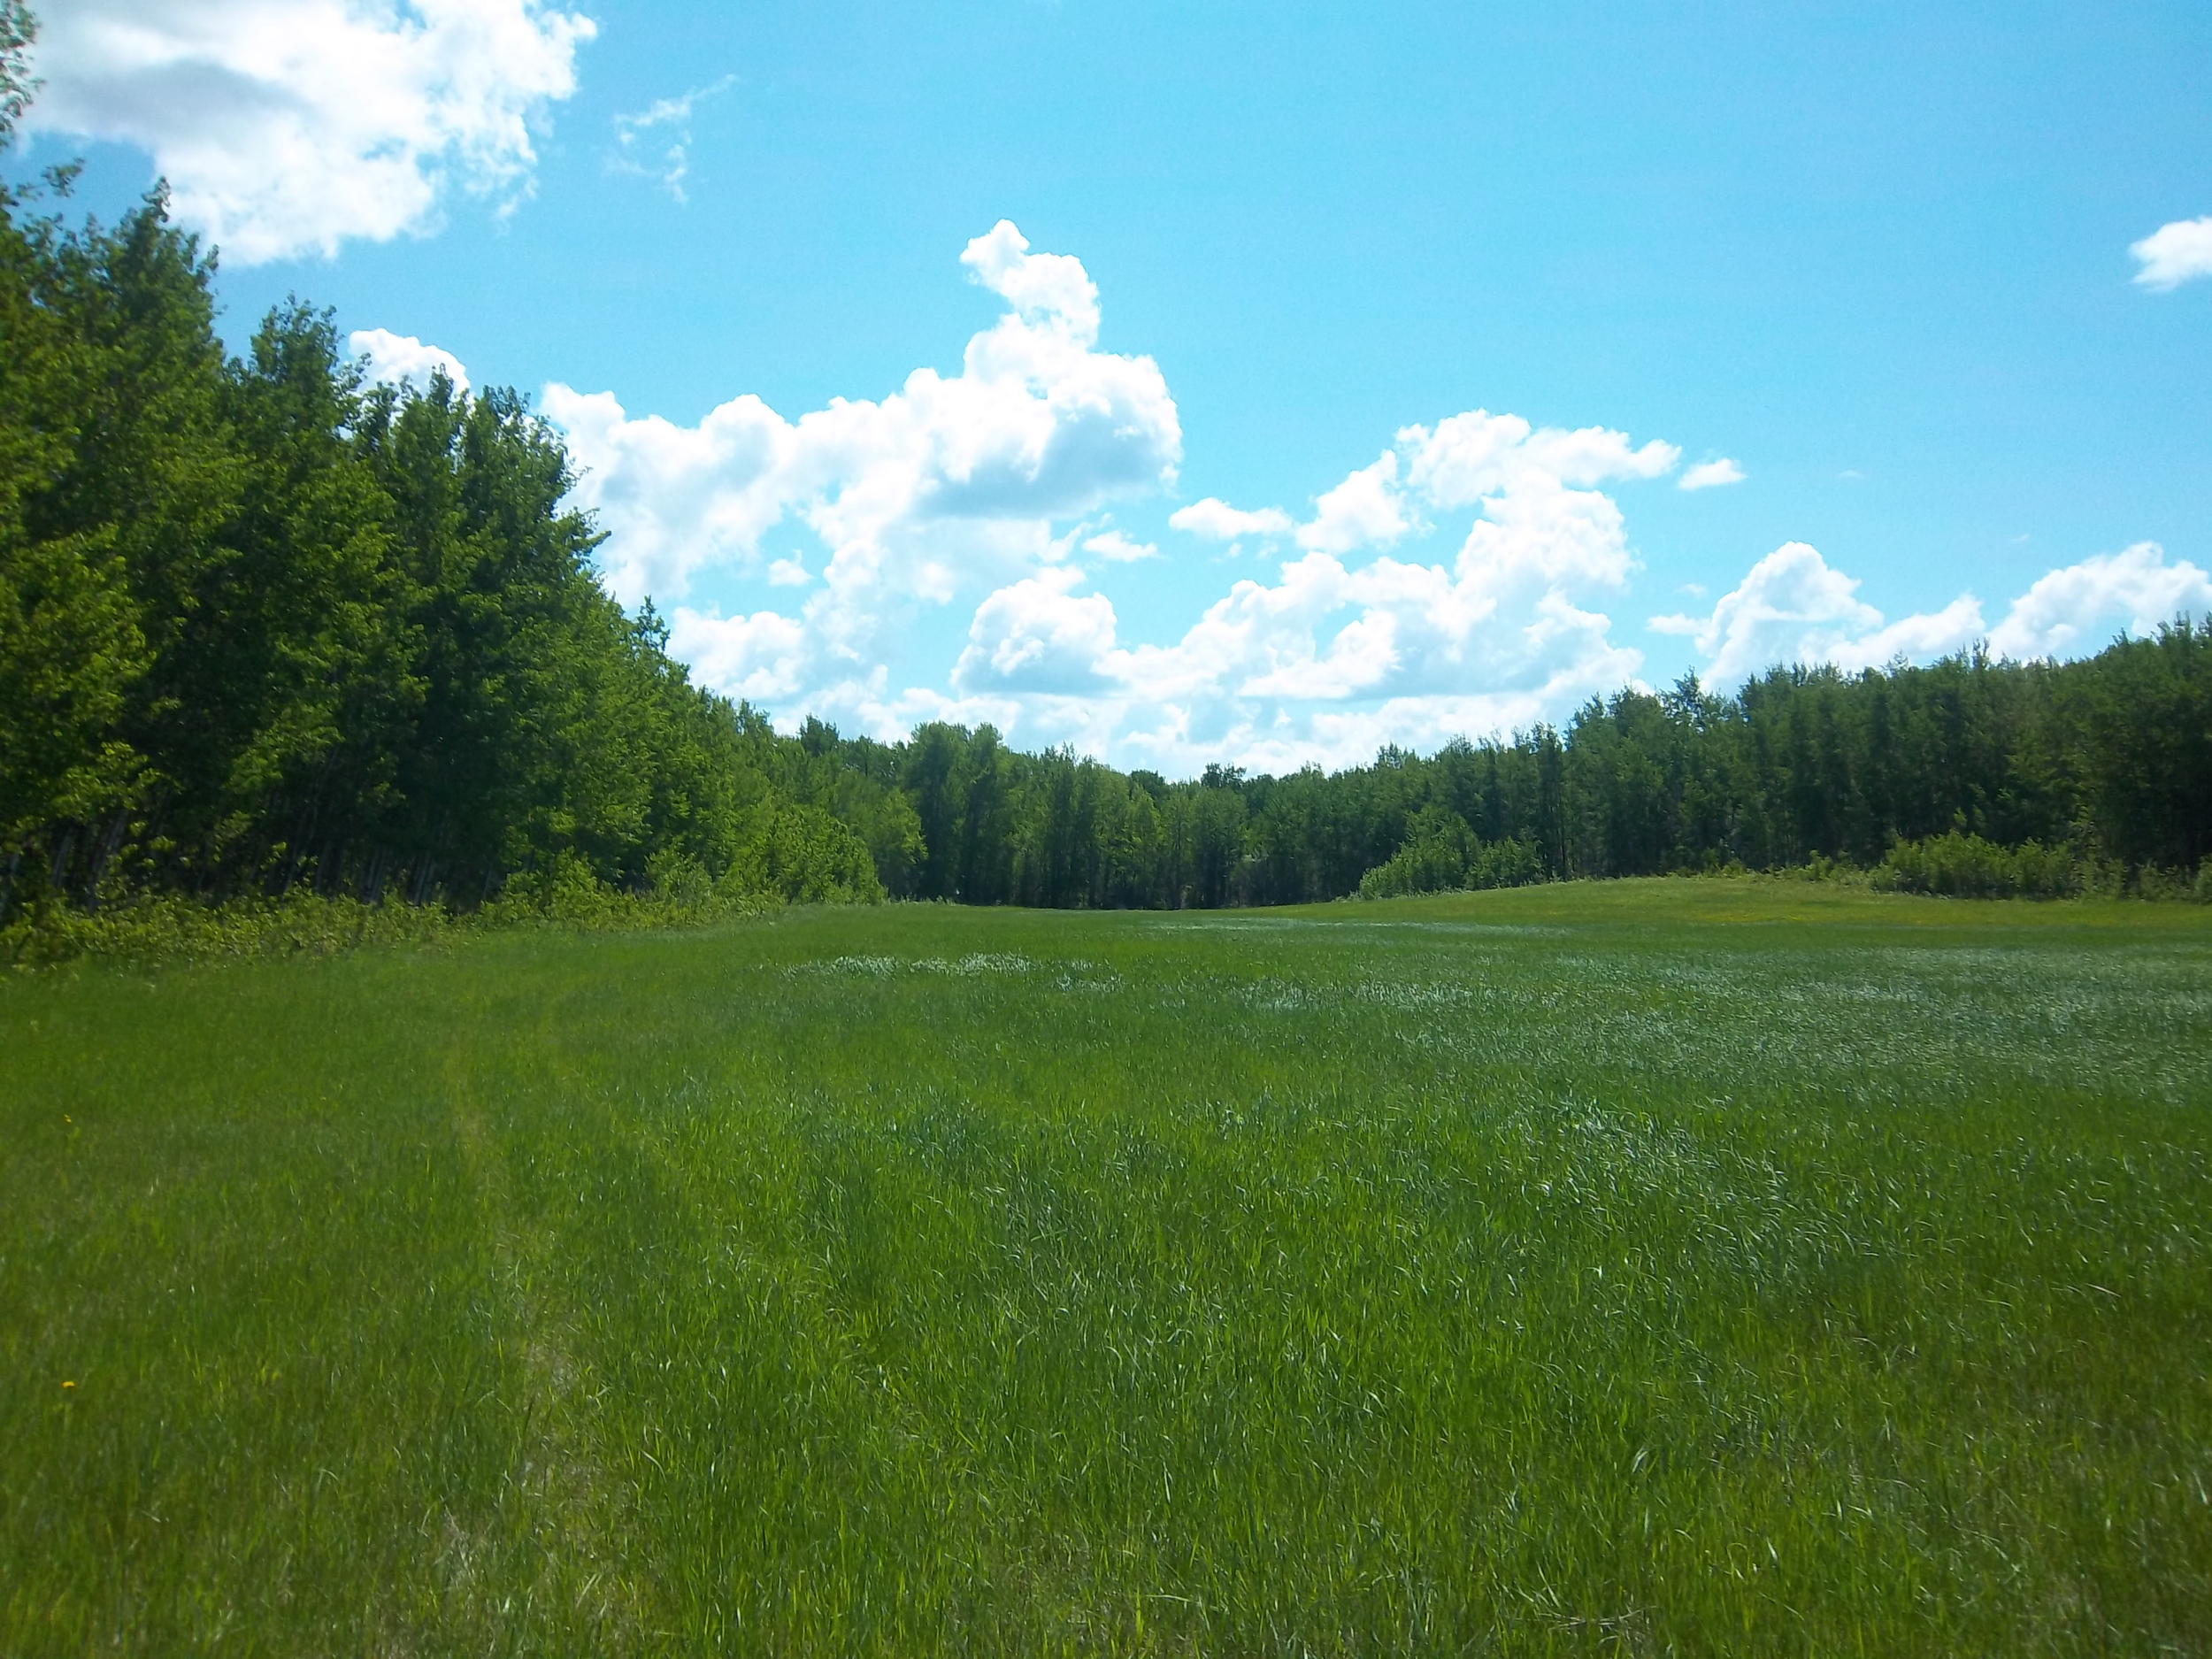 Biophysical and Wetland Assessment – Lac La Biche, Alberta